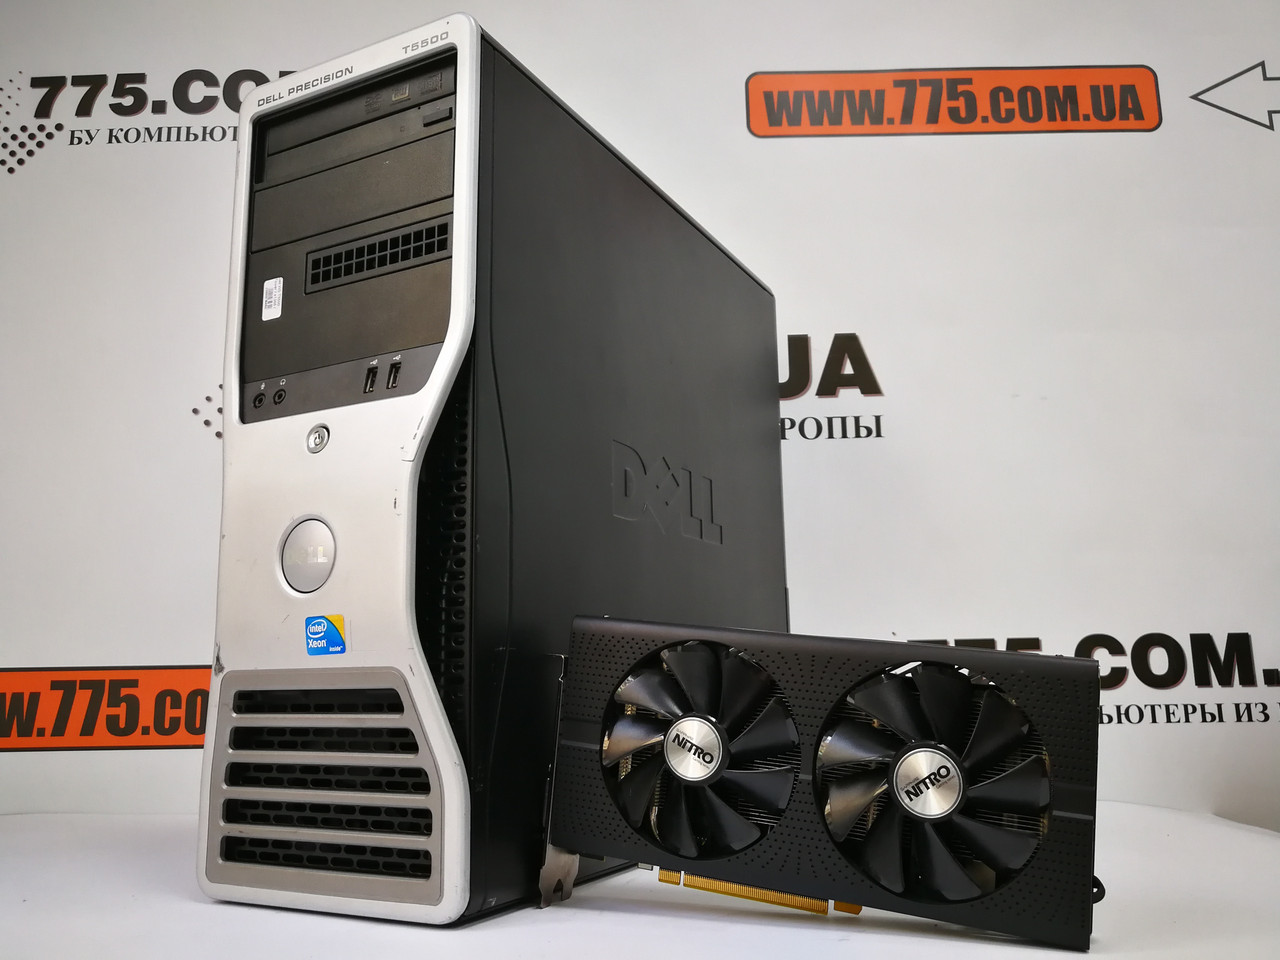 Игровой компьютер Dell WS T5500, Intel Xeon x5650 3.06GHz, RAM 12ГБ, SSD 120GB, HDD 3ТБ, RX 470 8GB